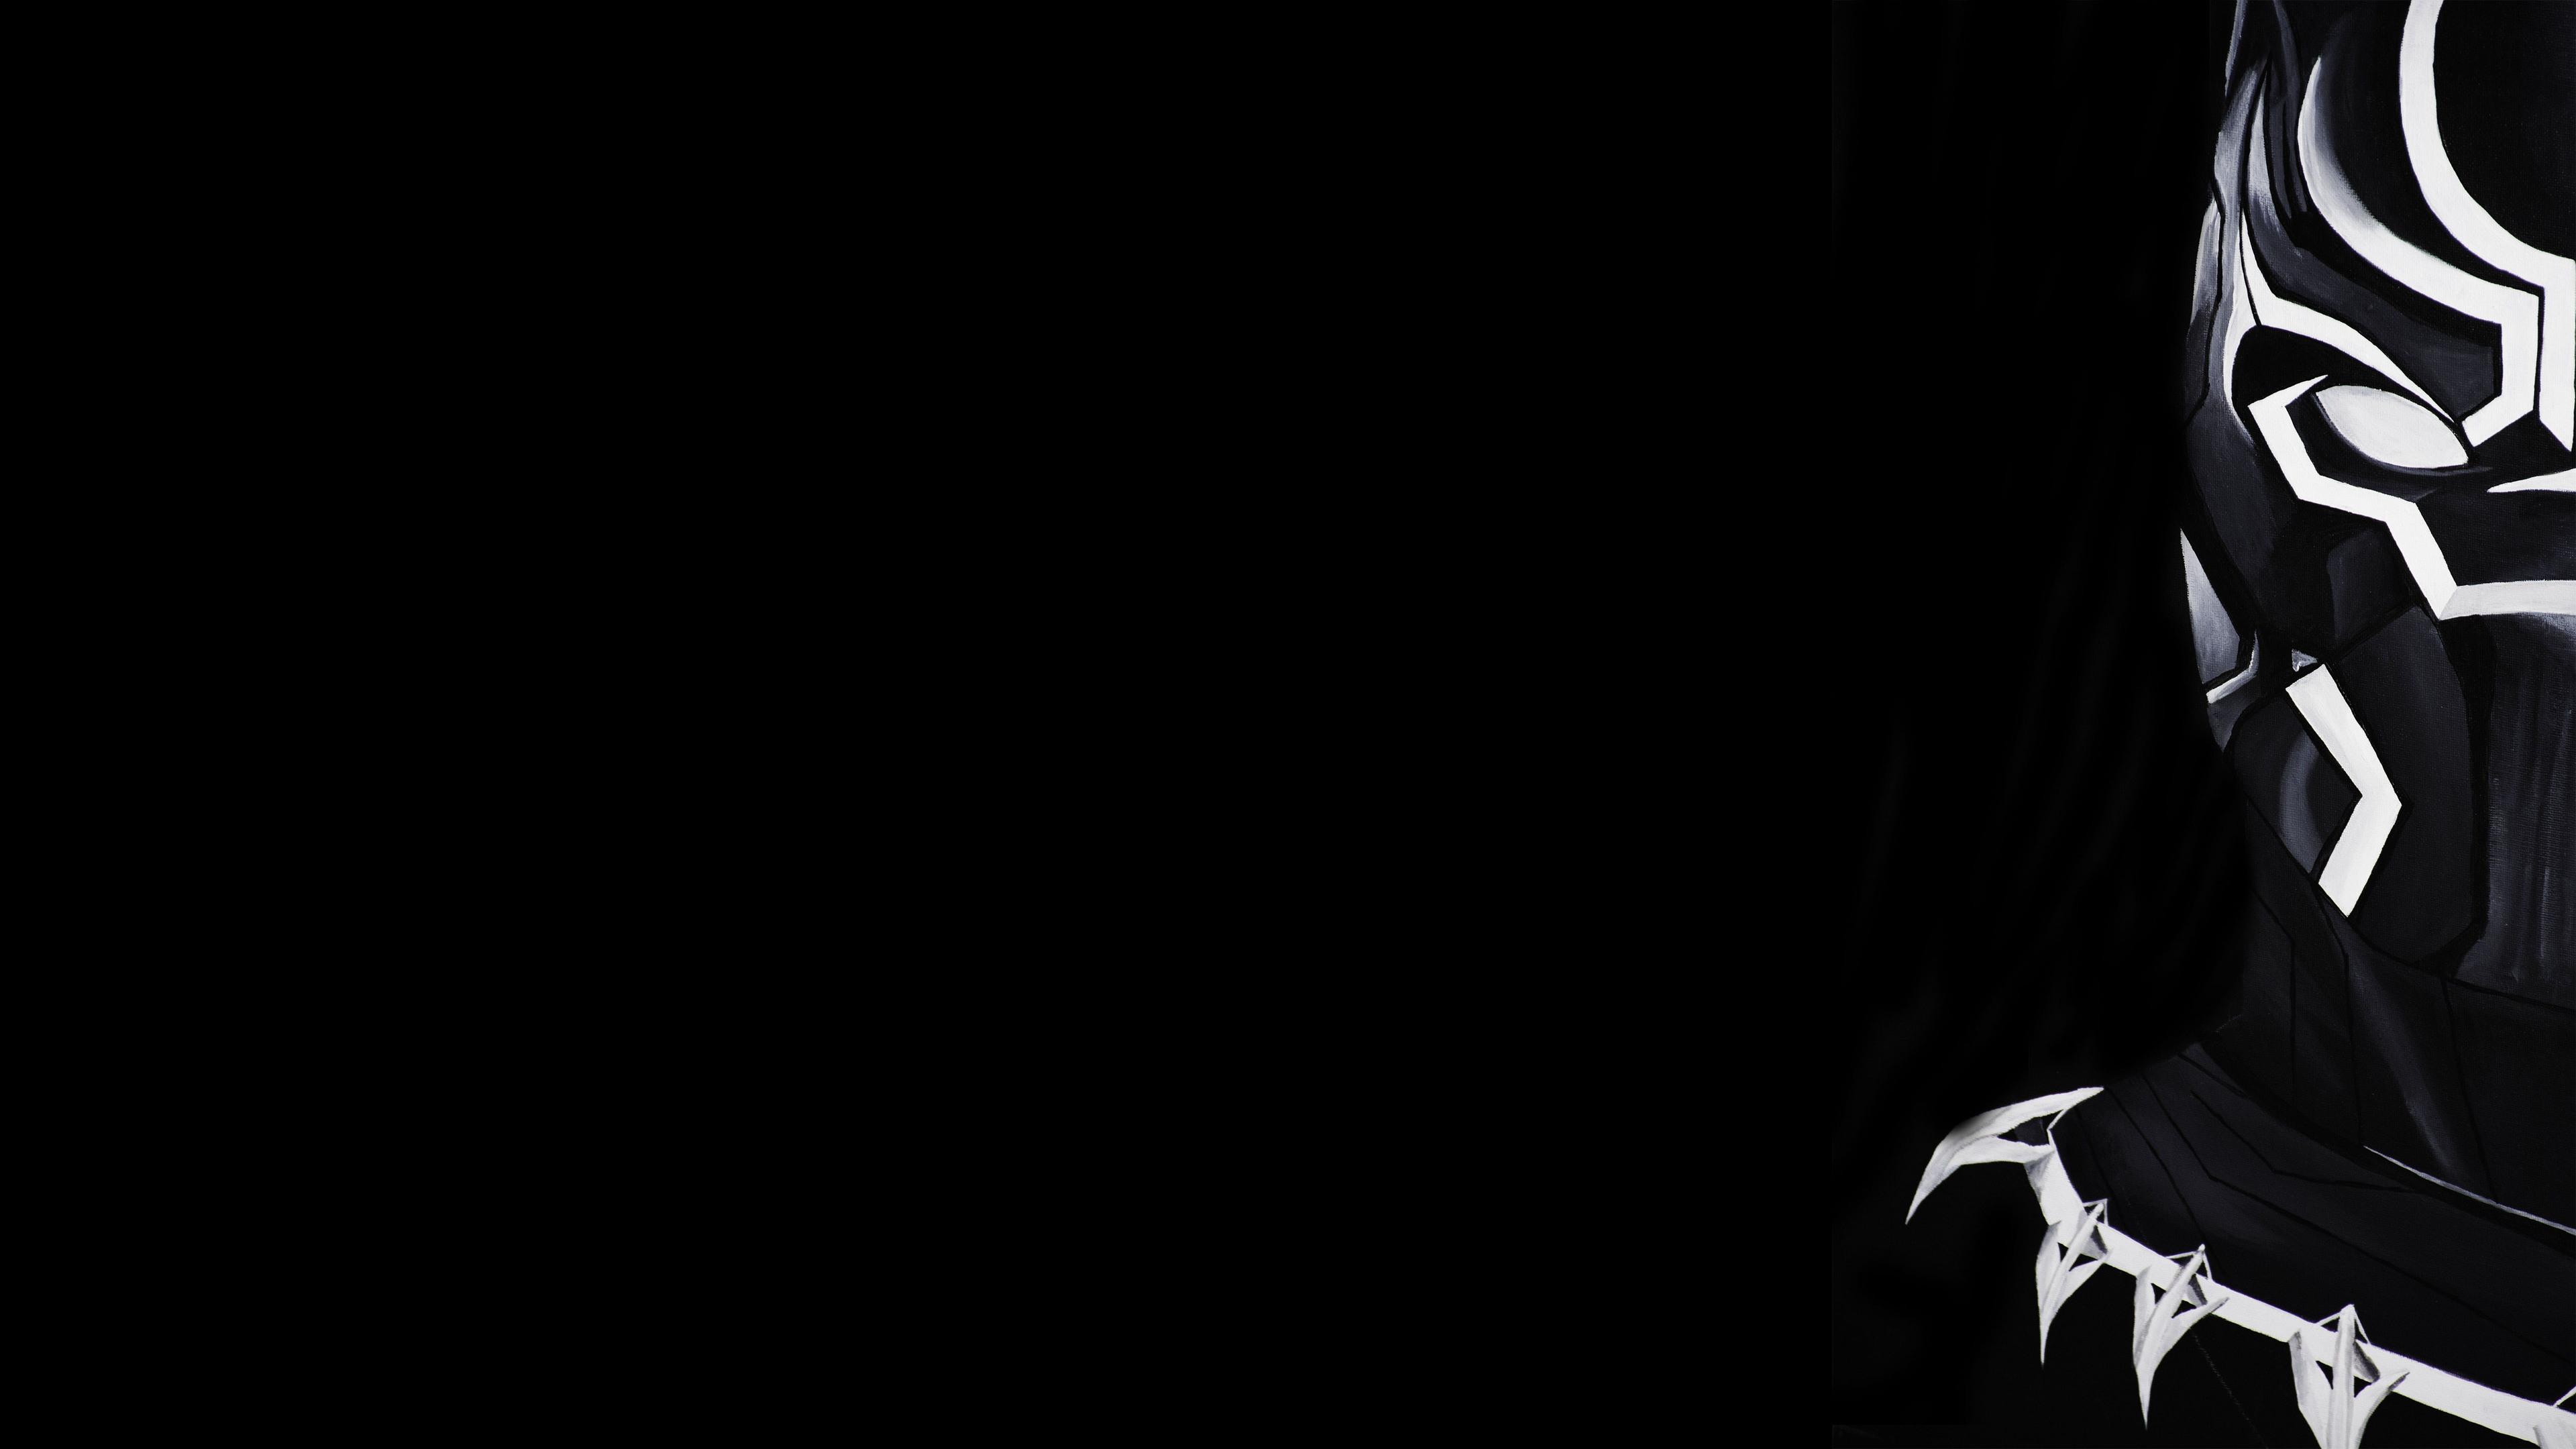 Wallpaper 4K Pc Black : black and white minimalistic dark ...